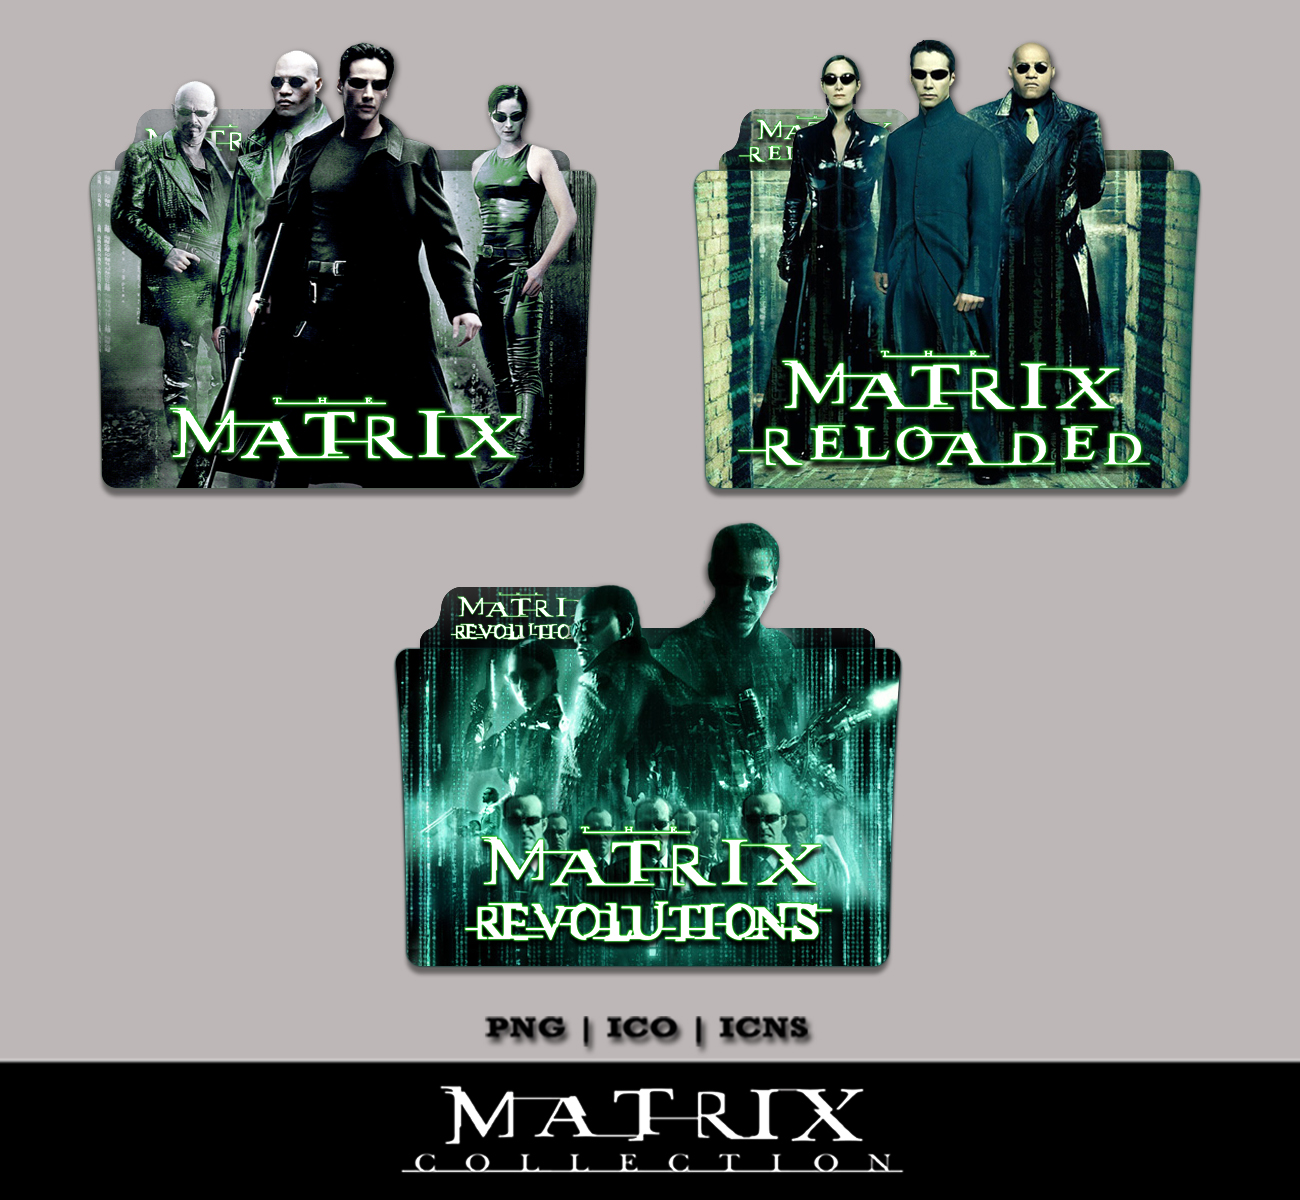 Matrix icon folder video / Coin drop necklace uk elements